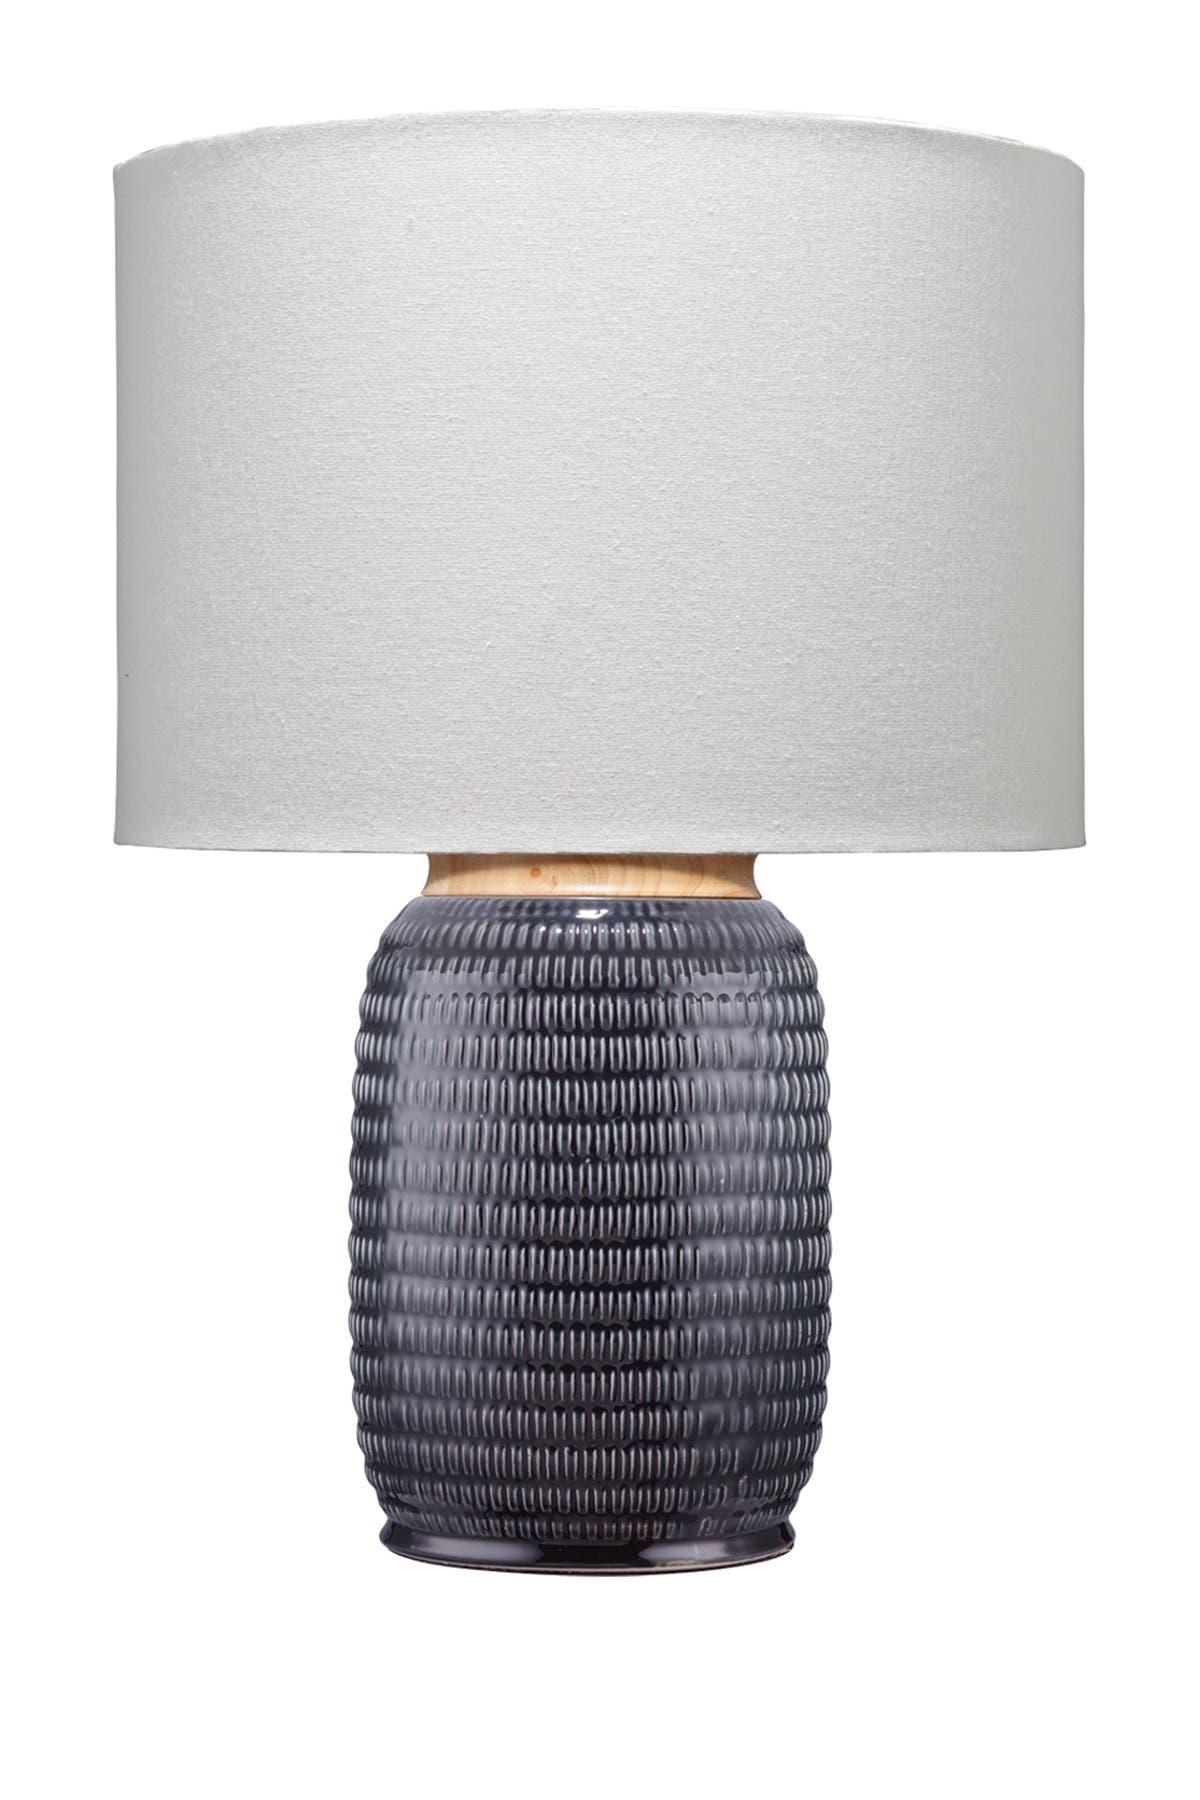 Image of Shine Studio Graham Table Lamp - Dark Navy Ceramic